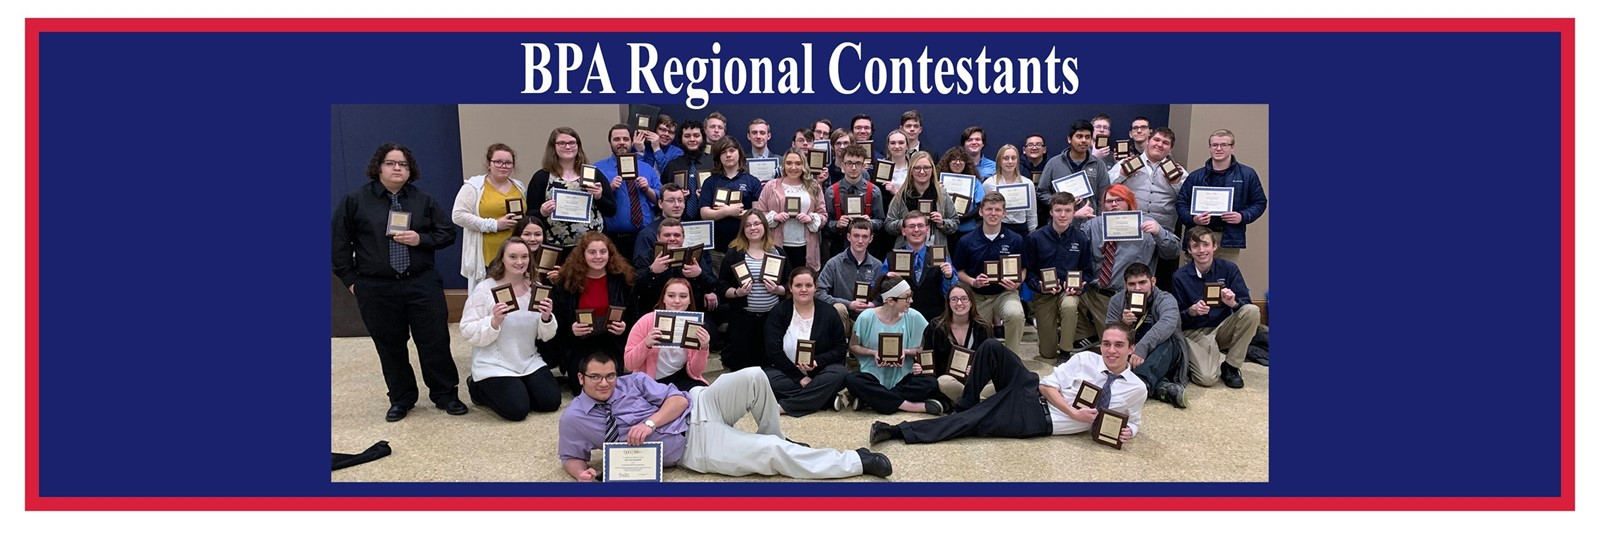 BPA Regionals